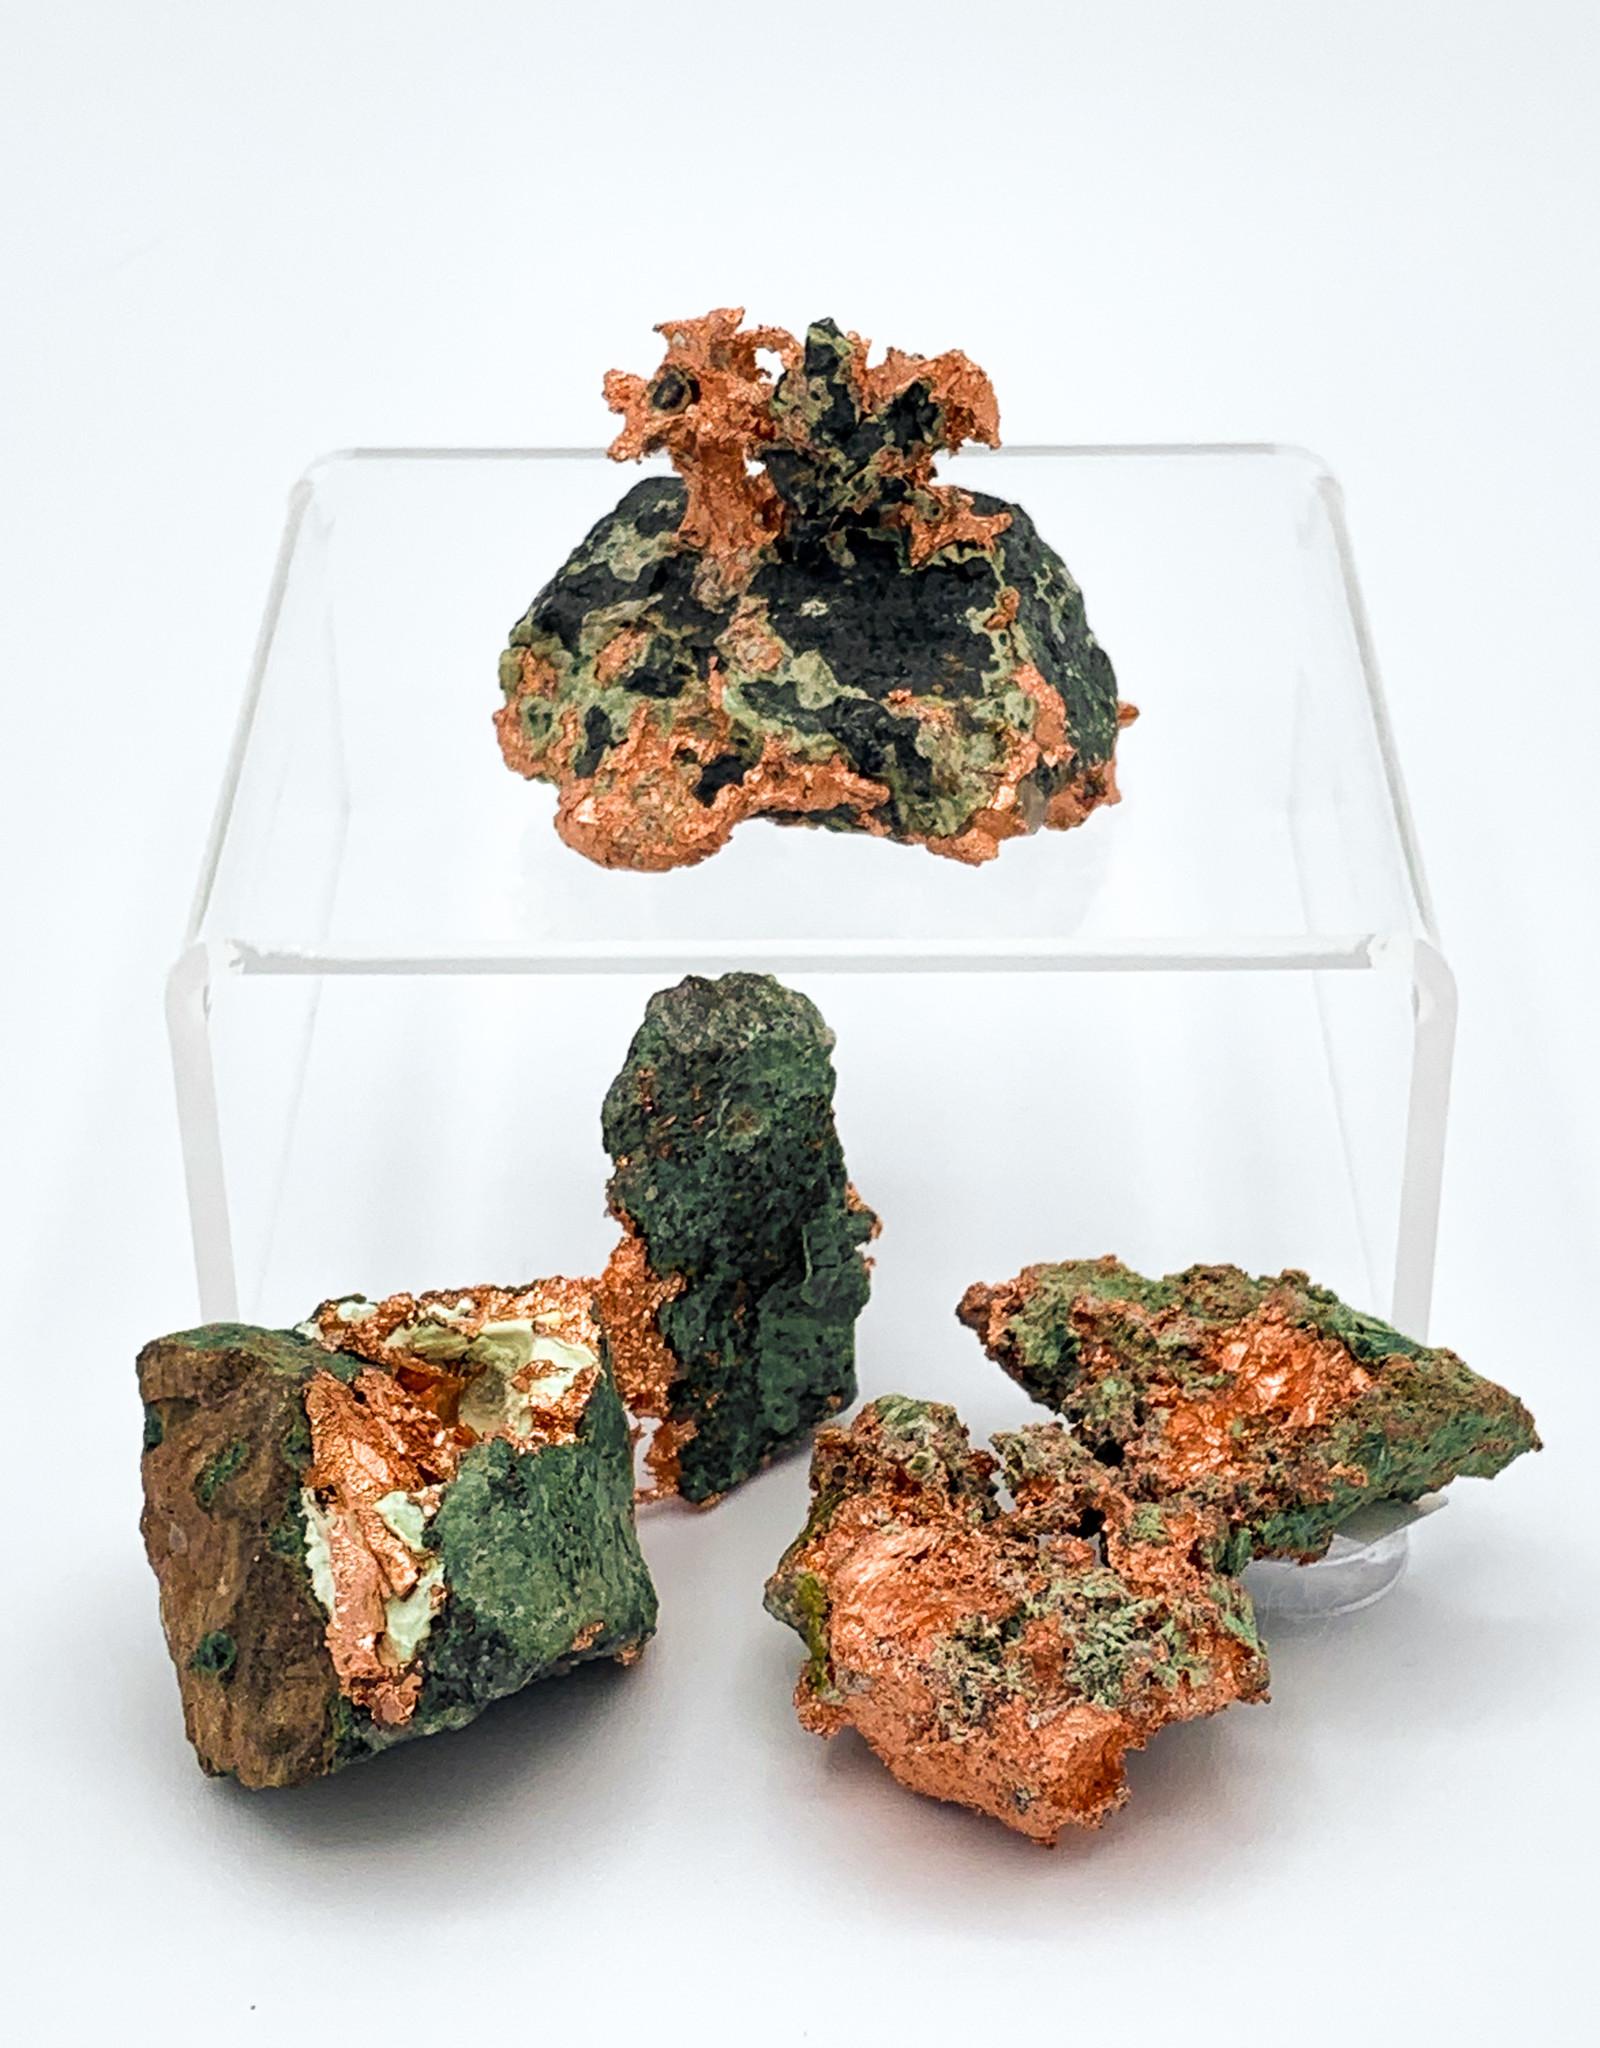 Native Copper (Keweenaw, MI)